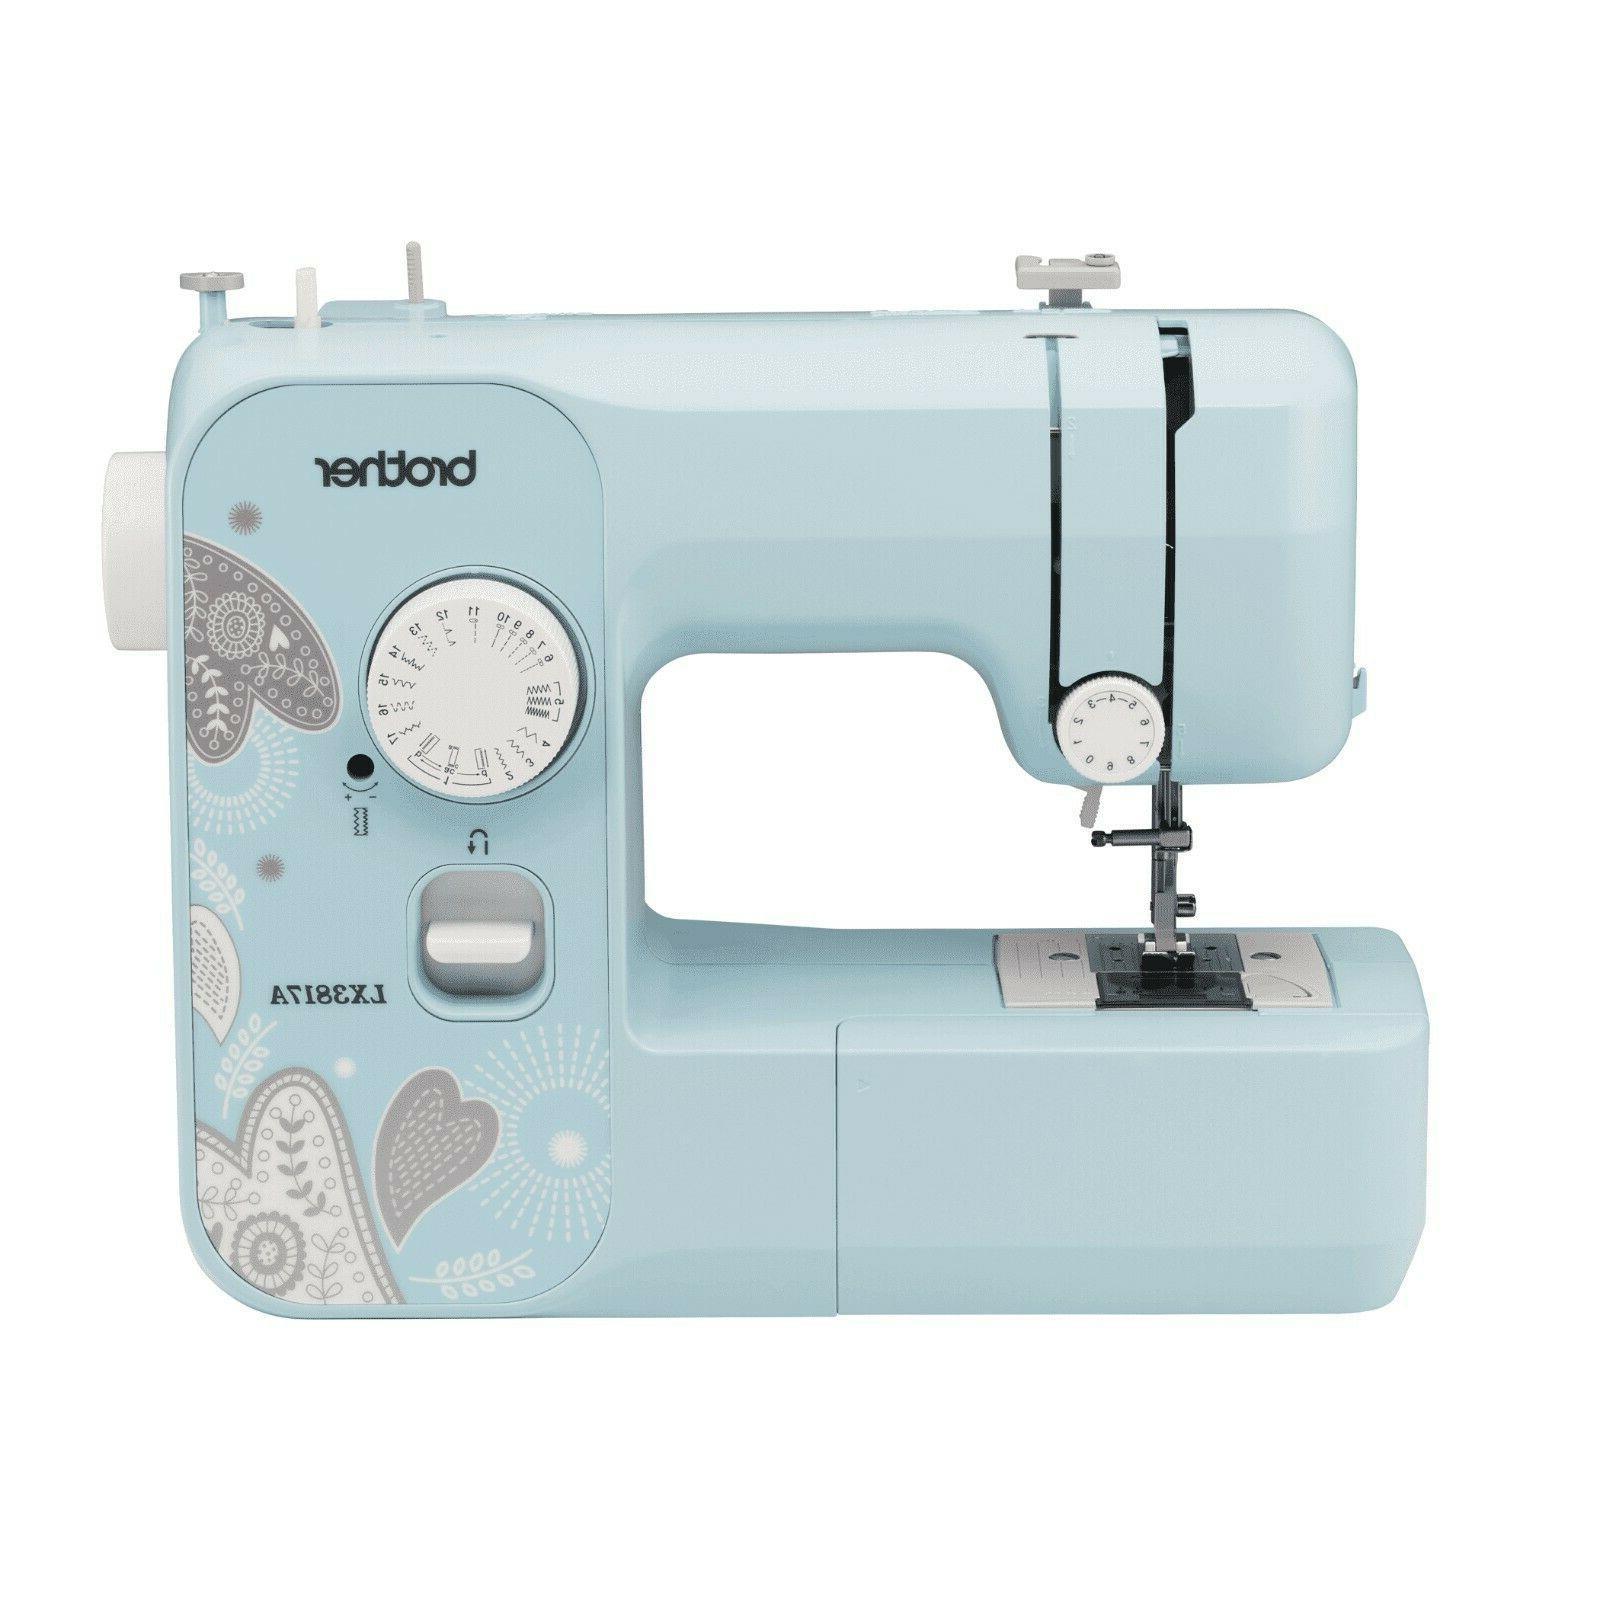 NEW Brother Full-Size Sewing Machine 17 Stitch LX3817A Turqu